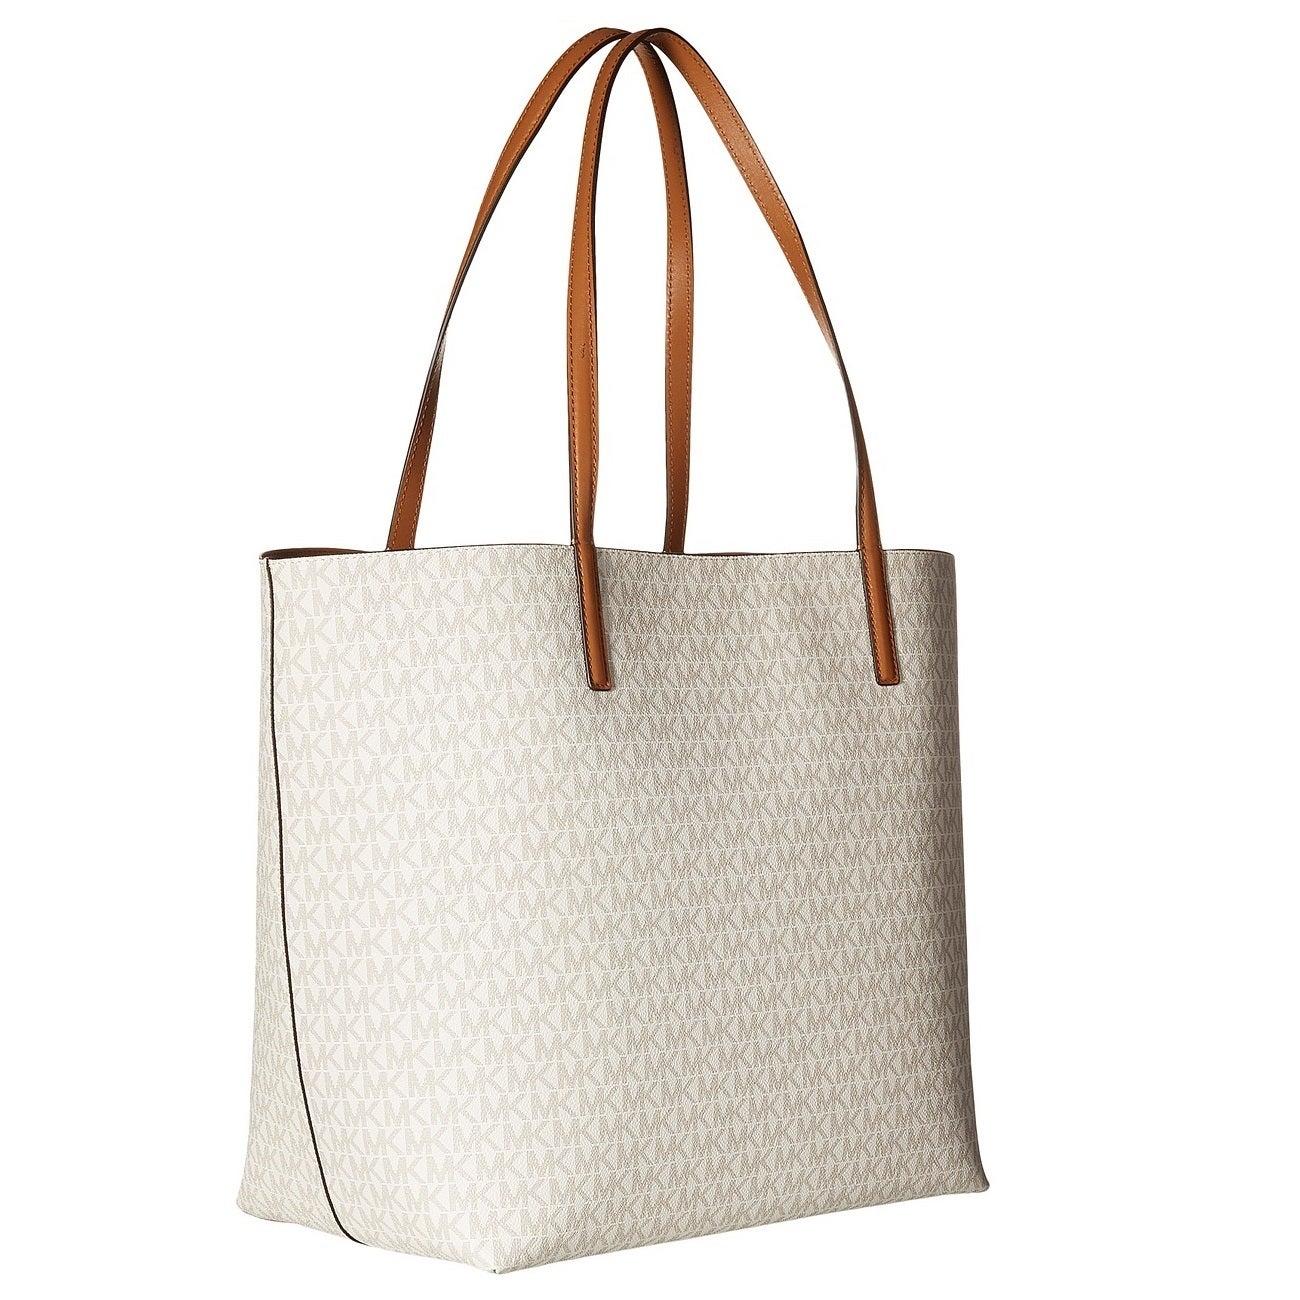 b1f0b4f73dff Shop Michael Kors Hayley Vanilla/ Acorn Large Logo Tote Bag - On Sale - Free  Shipping Today - Overstock - 12876168